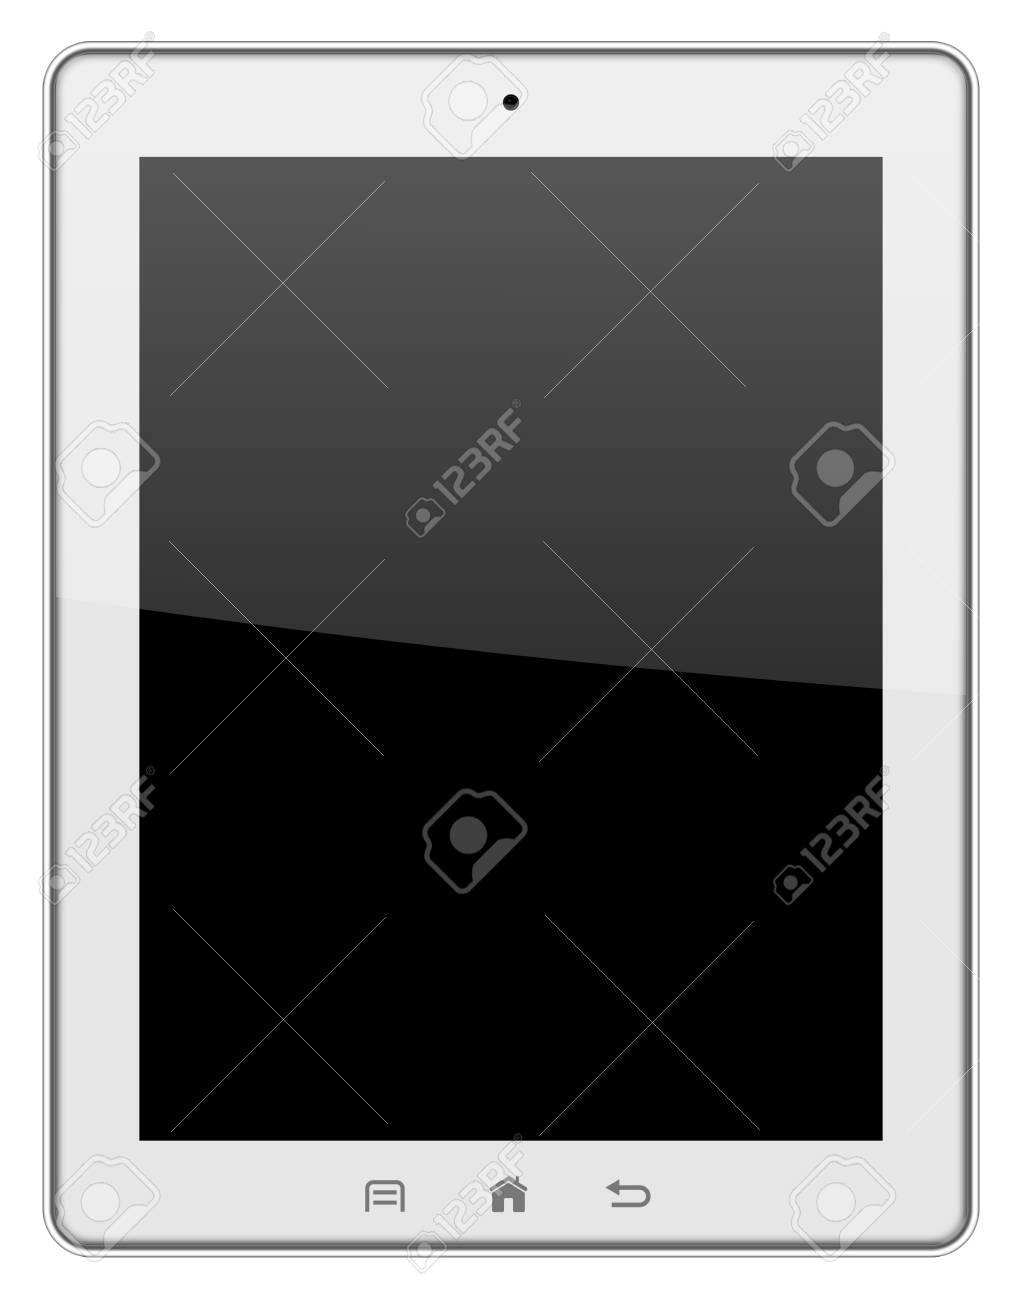 White tablet pc isolated on white background illustration Stock Photo - 17909422